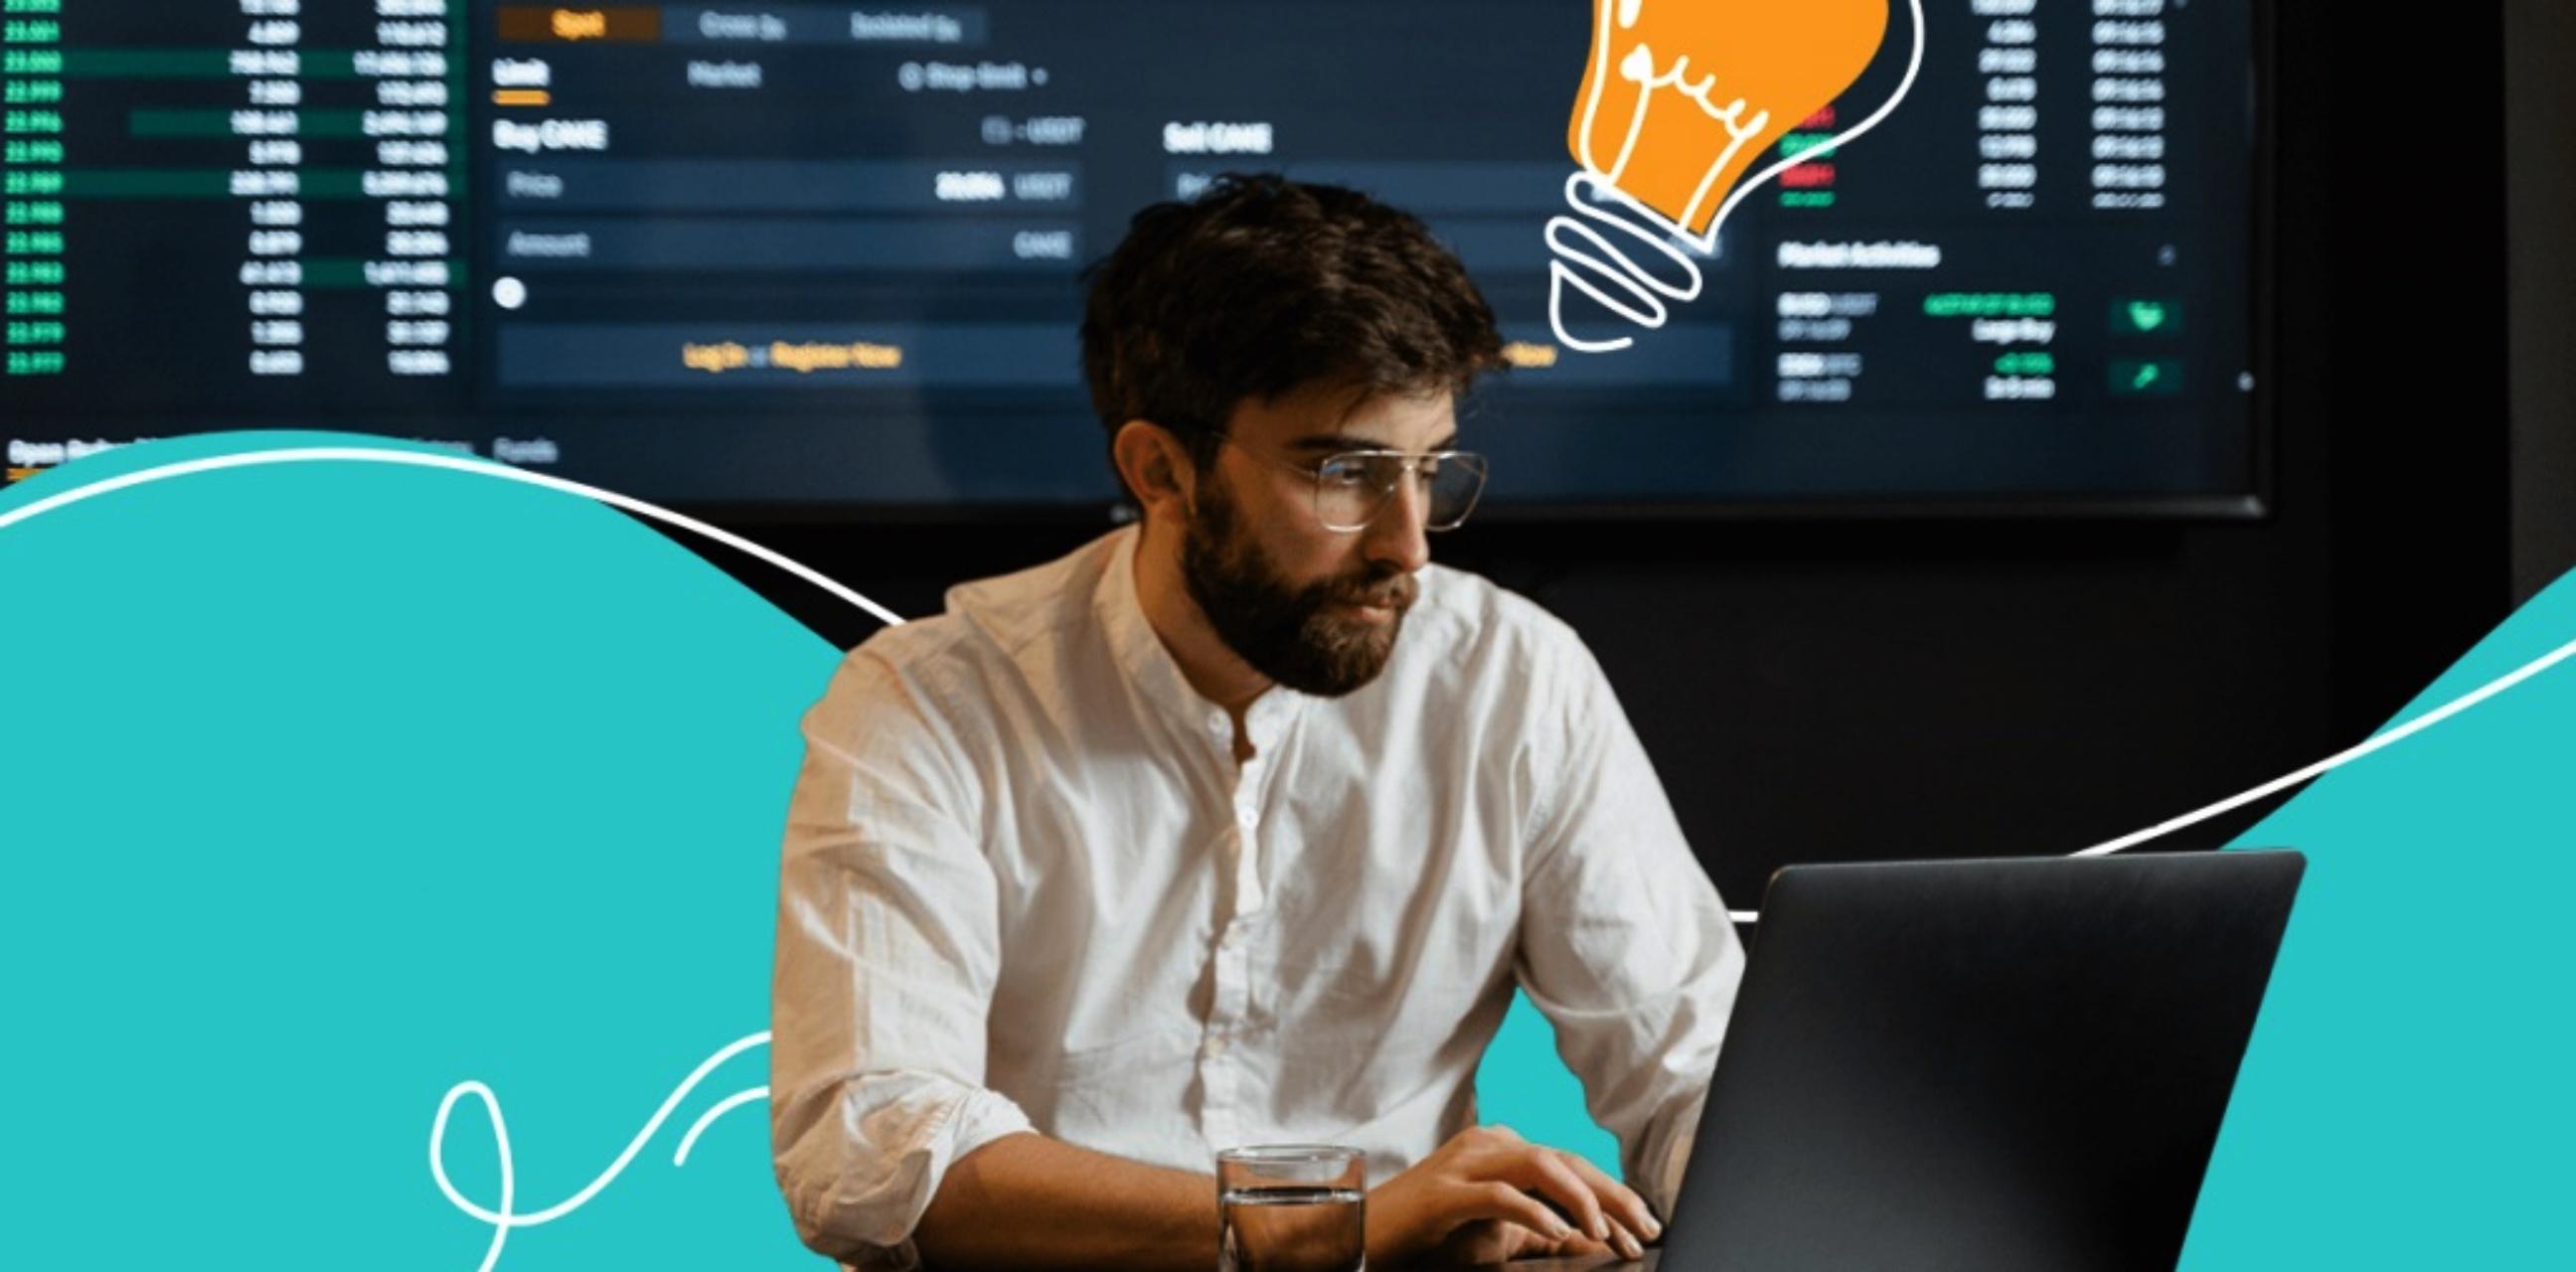 3 Manfaat perkembangan teknologi digital, banyak muncul pekerjaan baru